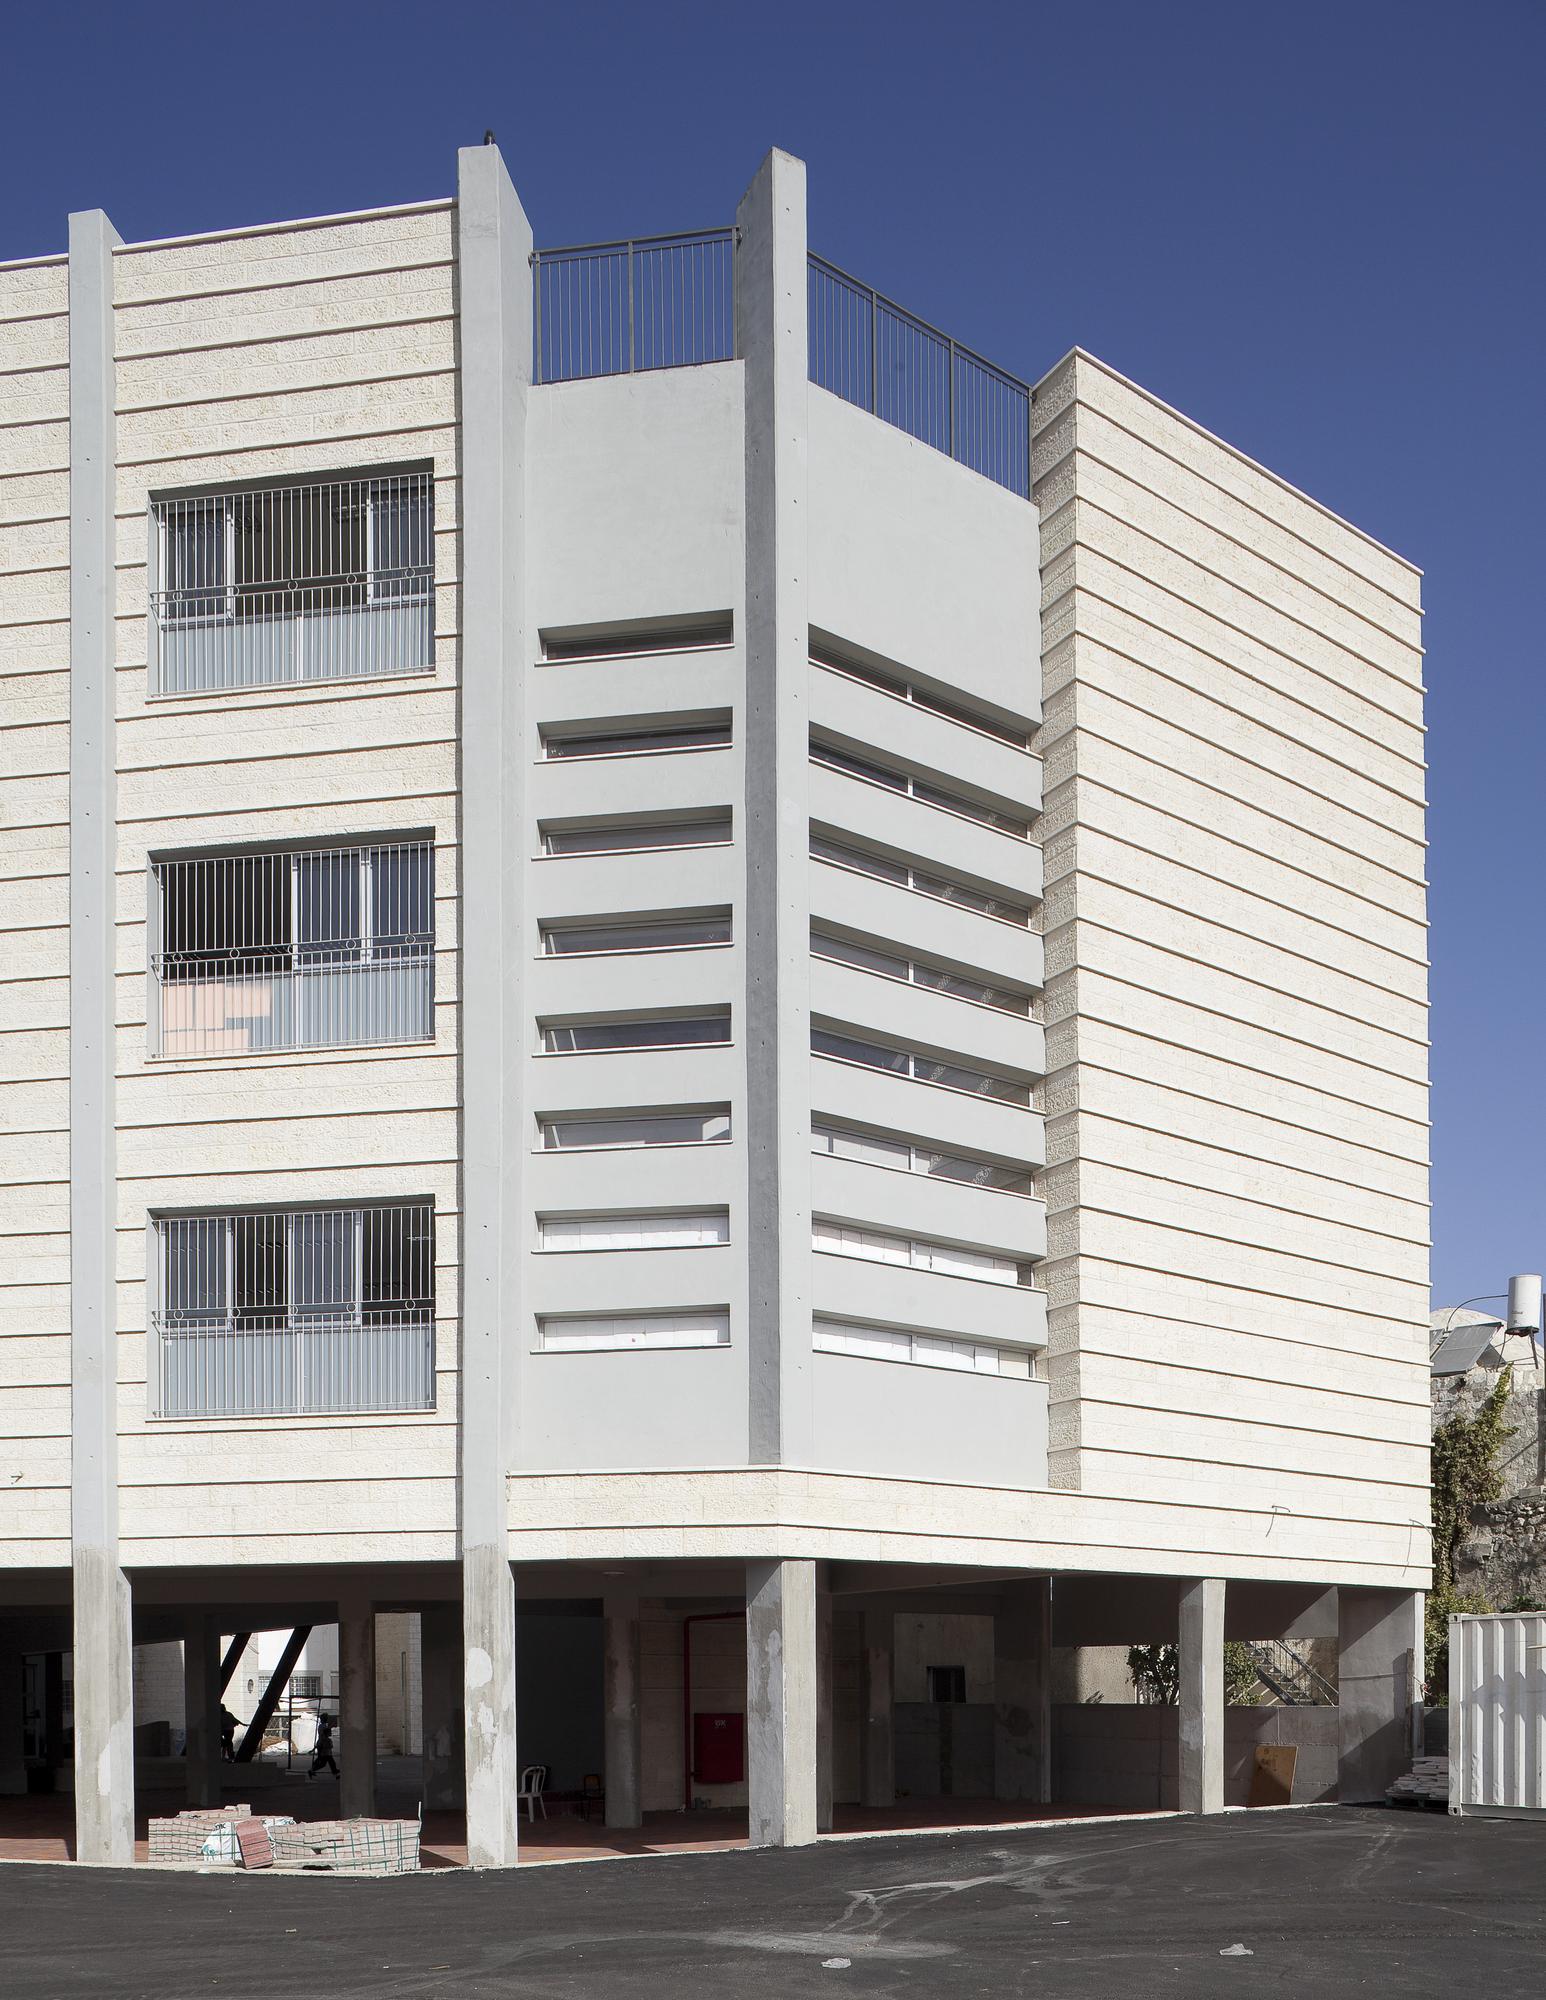 Orthodox School in Remle / Dan and Hila Israelevitz Architects